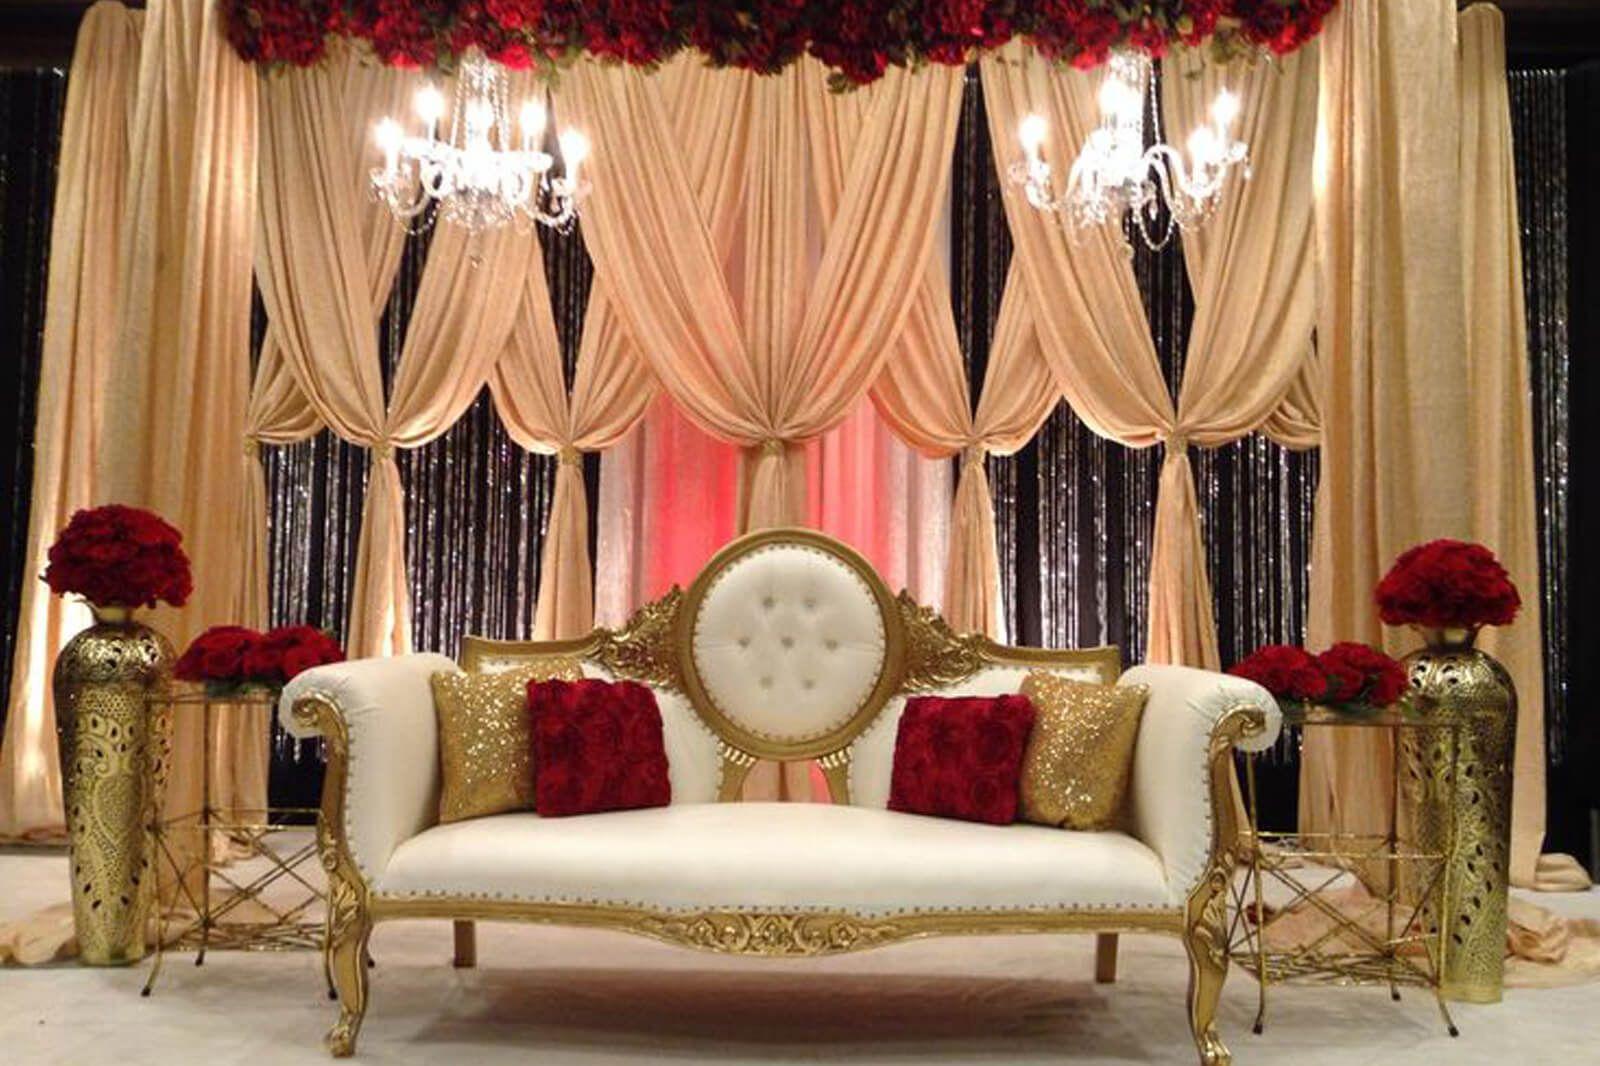 Indian wedding bedroom decoration ideas - India Wedding Backdrop Google Search Kids Birthday Party Pinterest Wedding Stage Decorations Stage Decorations And Wedding Stage